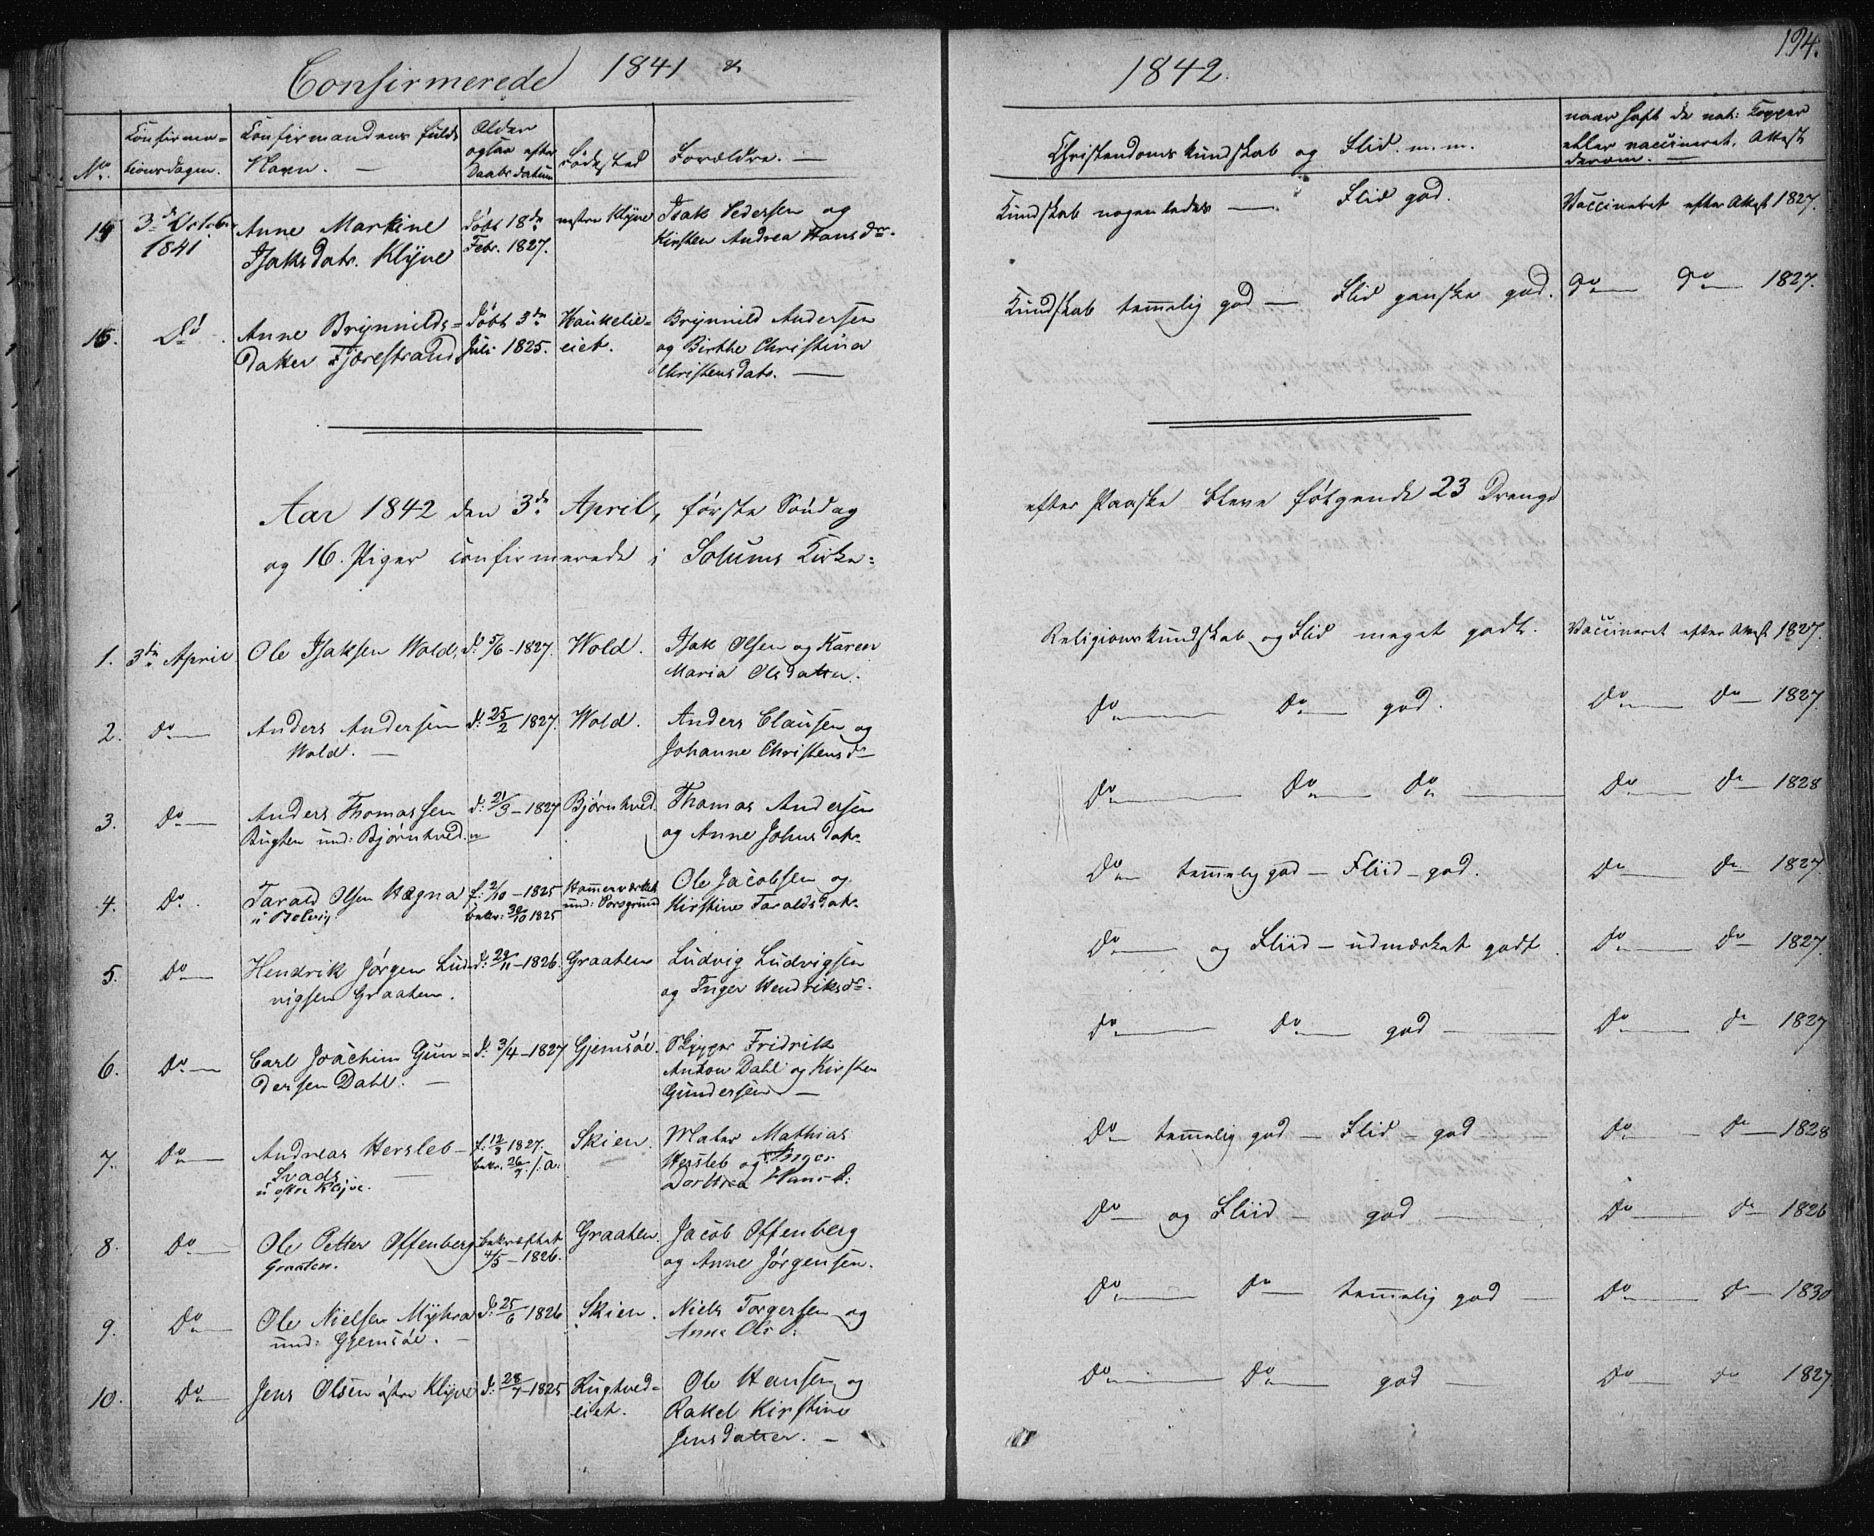 SAKO, Solum kirkebøker, F/Fa/L0005: Ministerialbok nr. I 5, 1833-1843, s. 194